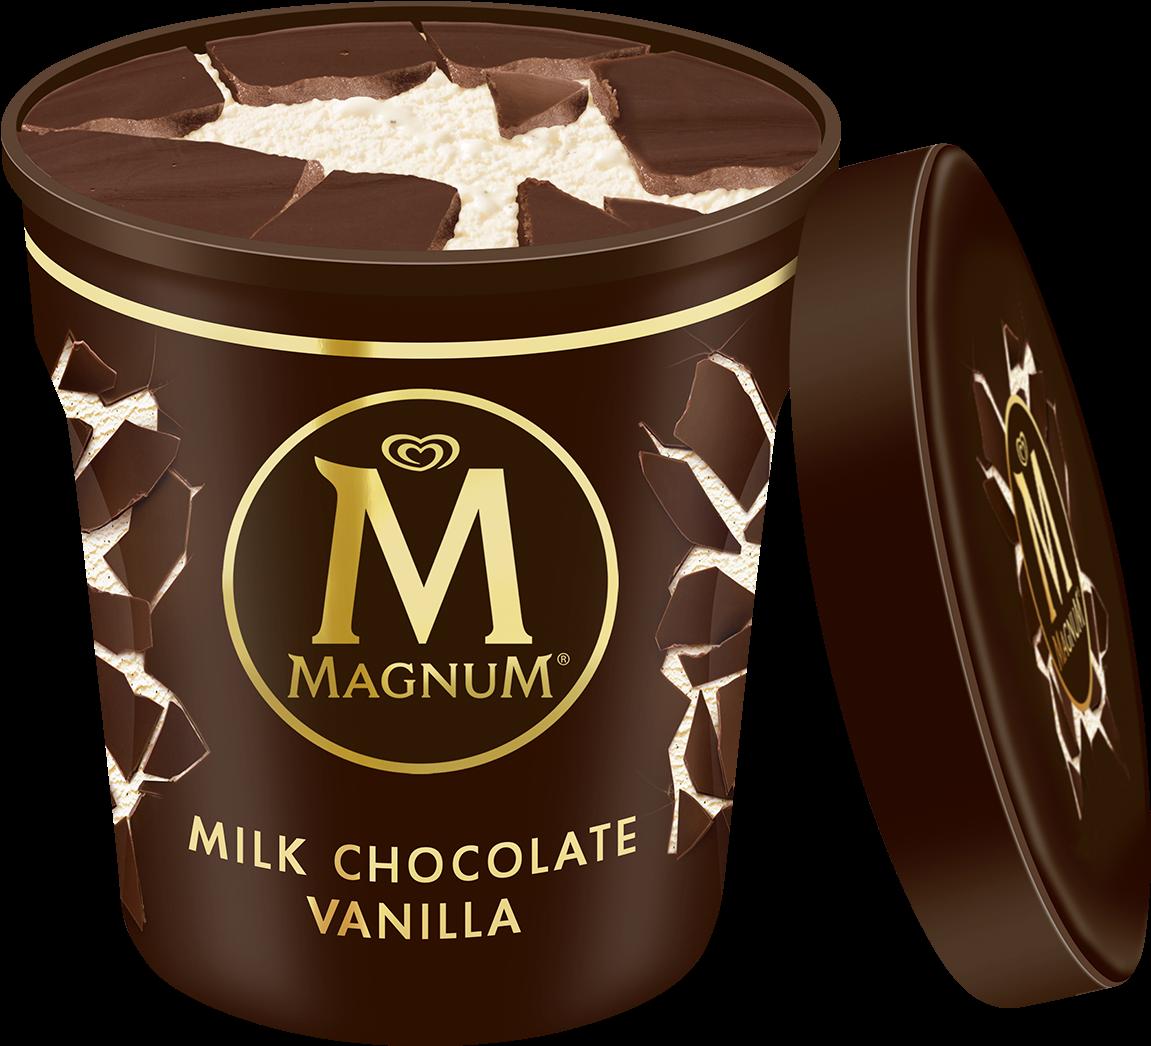 Download Receta De La Paleta Magnum De Veronica Ferraro Magnum Ice Cream Pint Png Image With No Background Pngkey Com